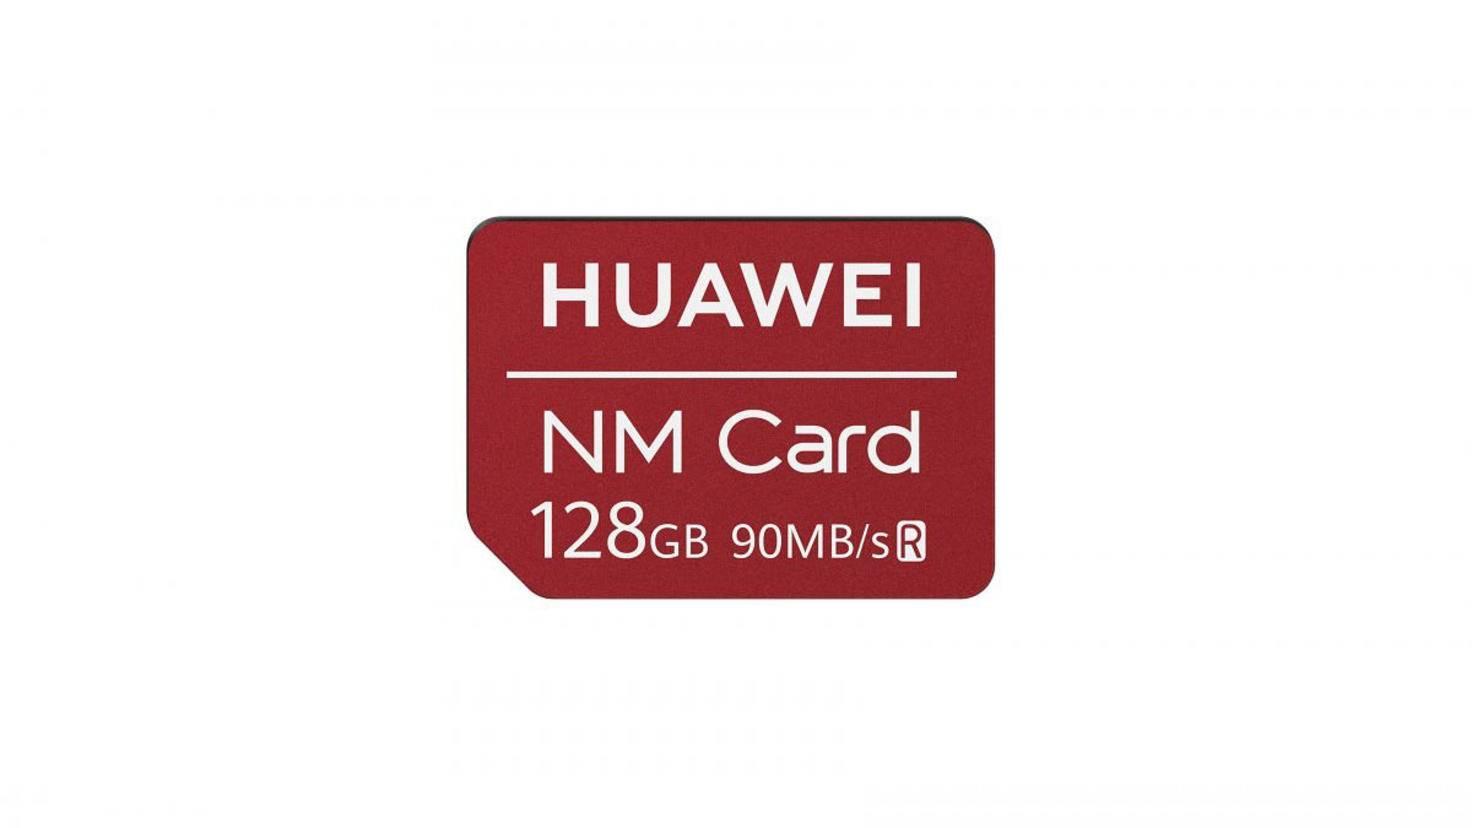 Eine Speicherkarte namens NM soll hohe Transferraten erlauben.